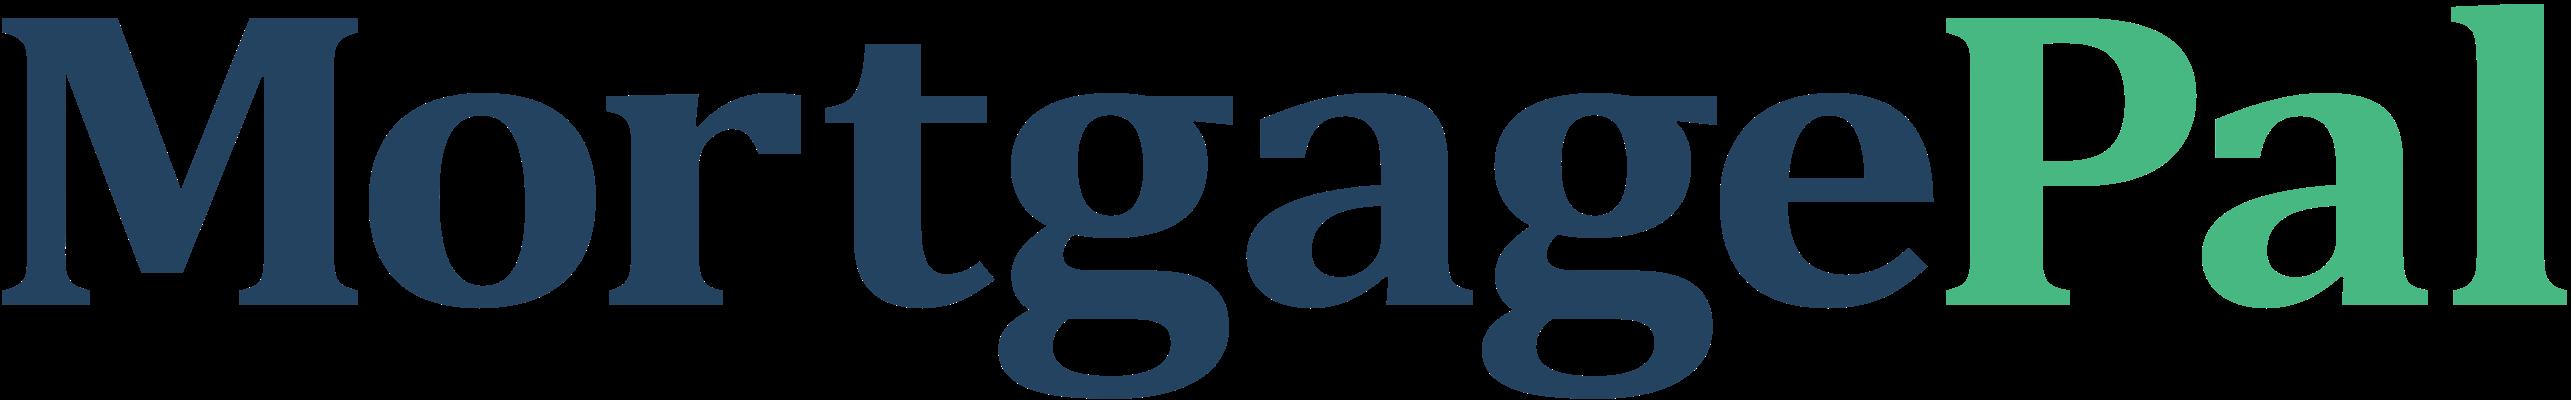 mortgagepal logo